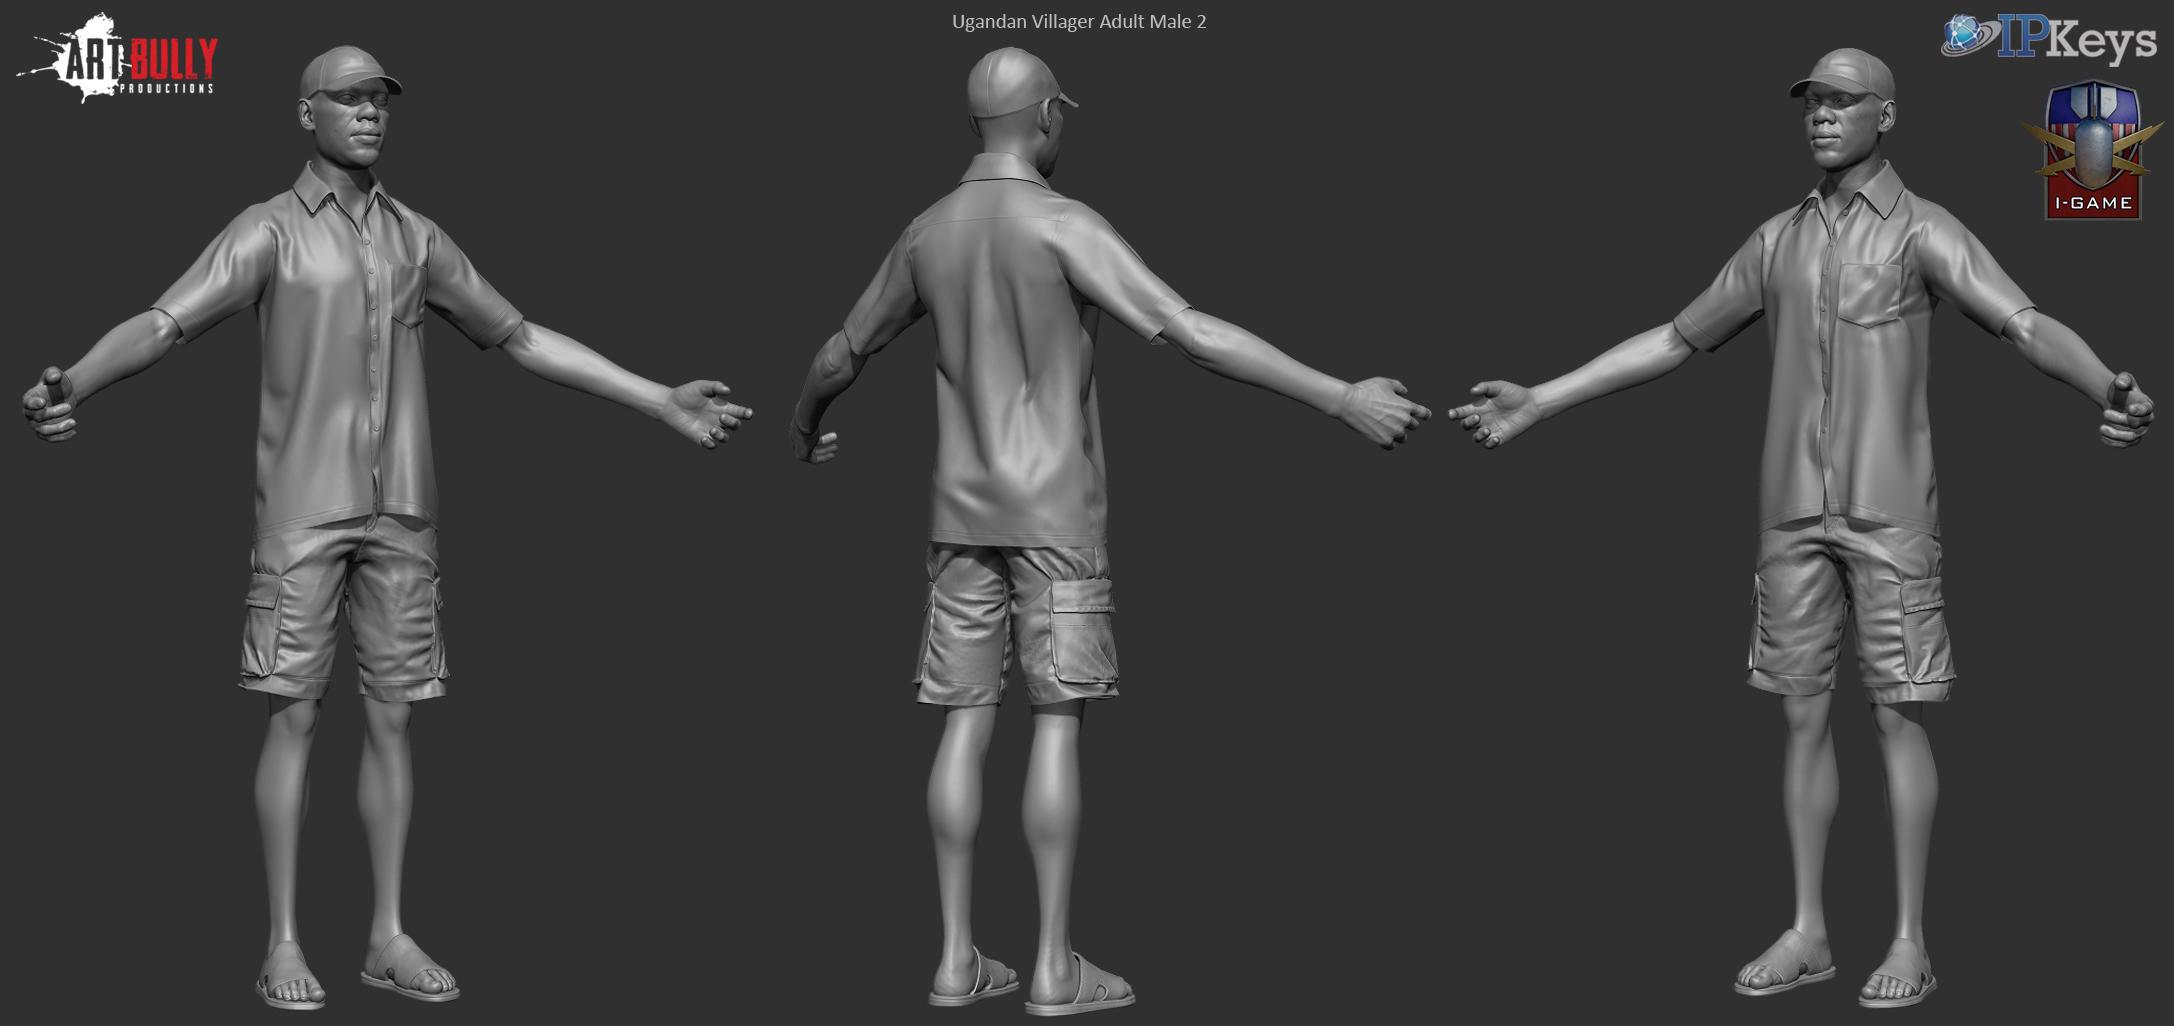 Ugandan_Villager_Adult_Male_Sculpt2.jpg